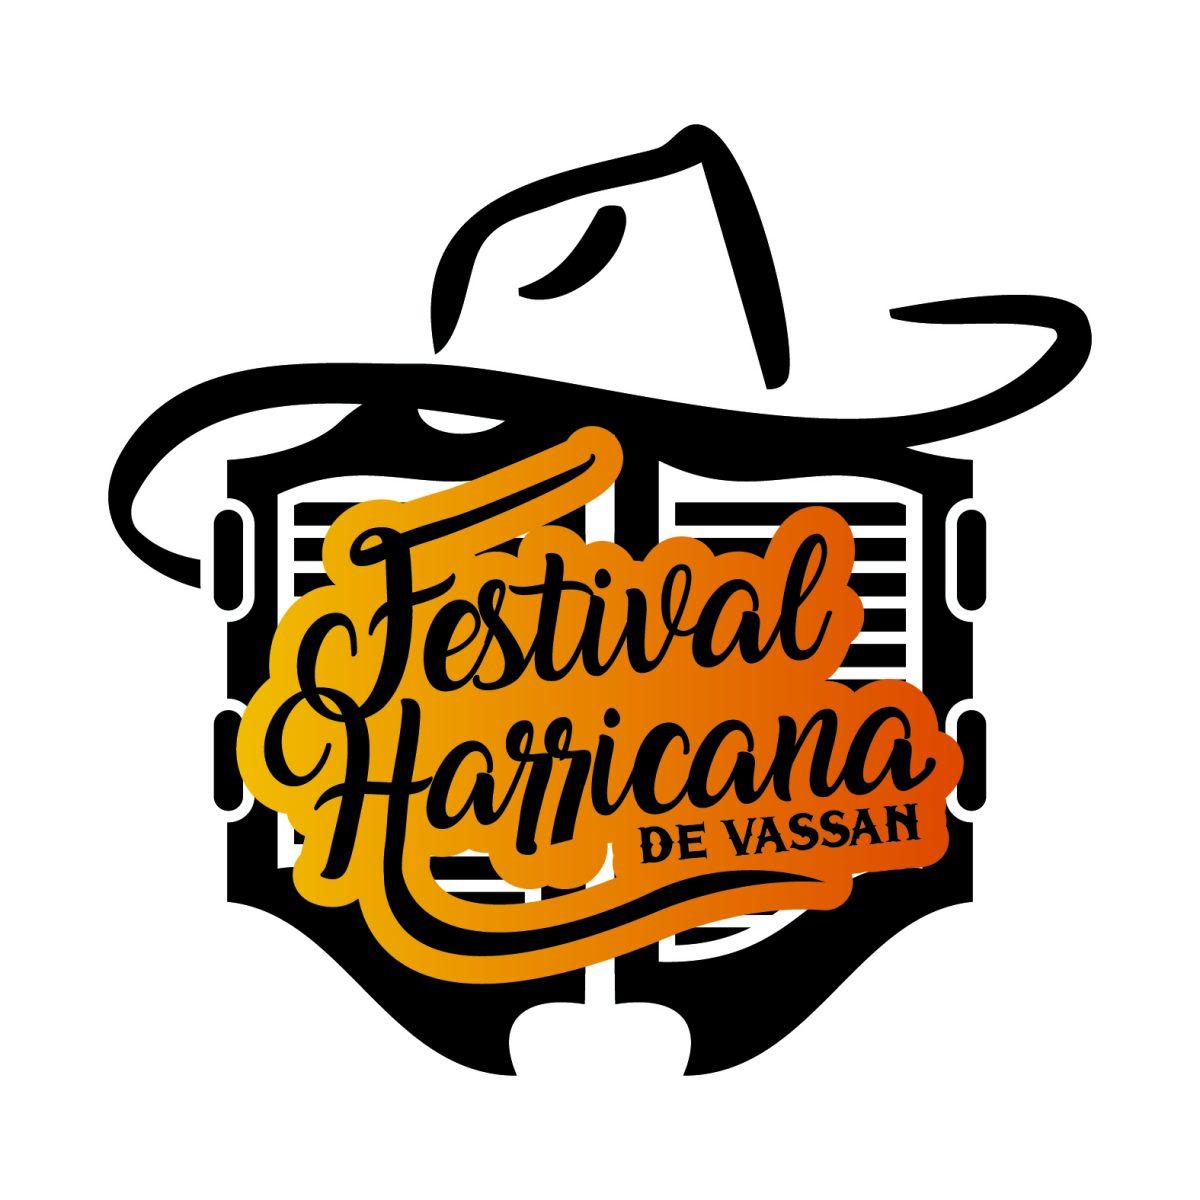 Festival Harricana de Vassan